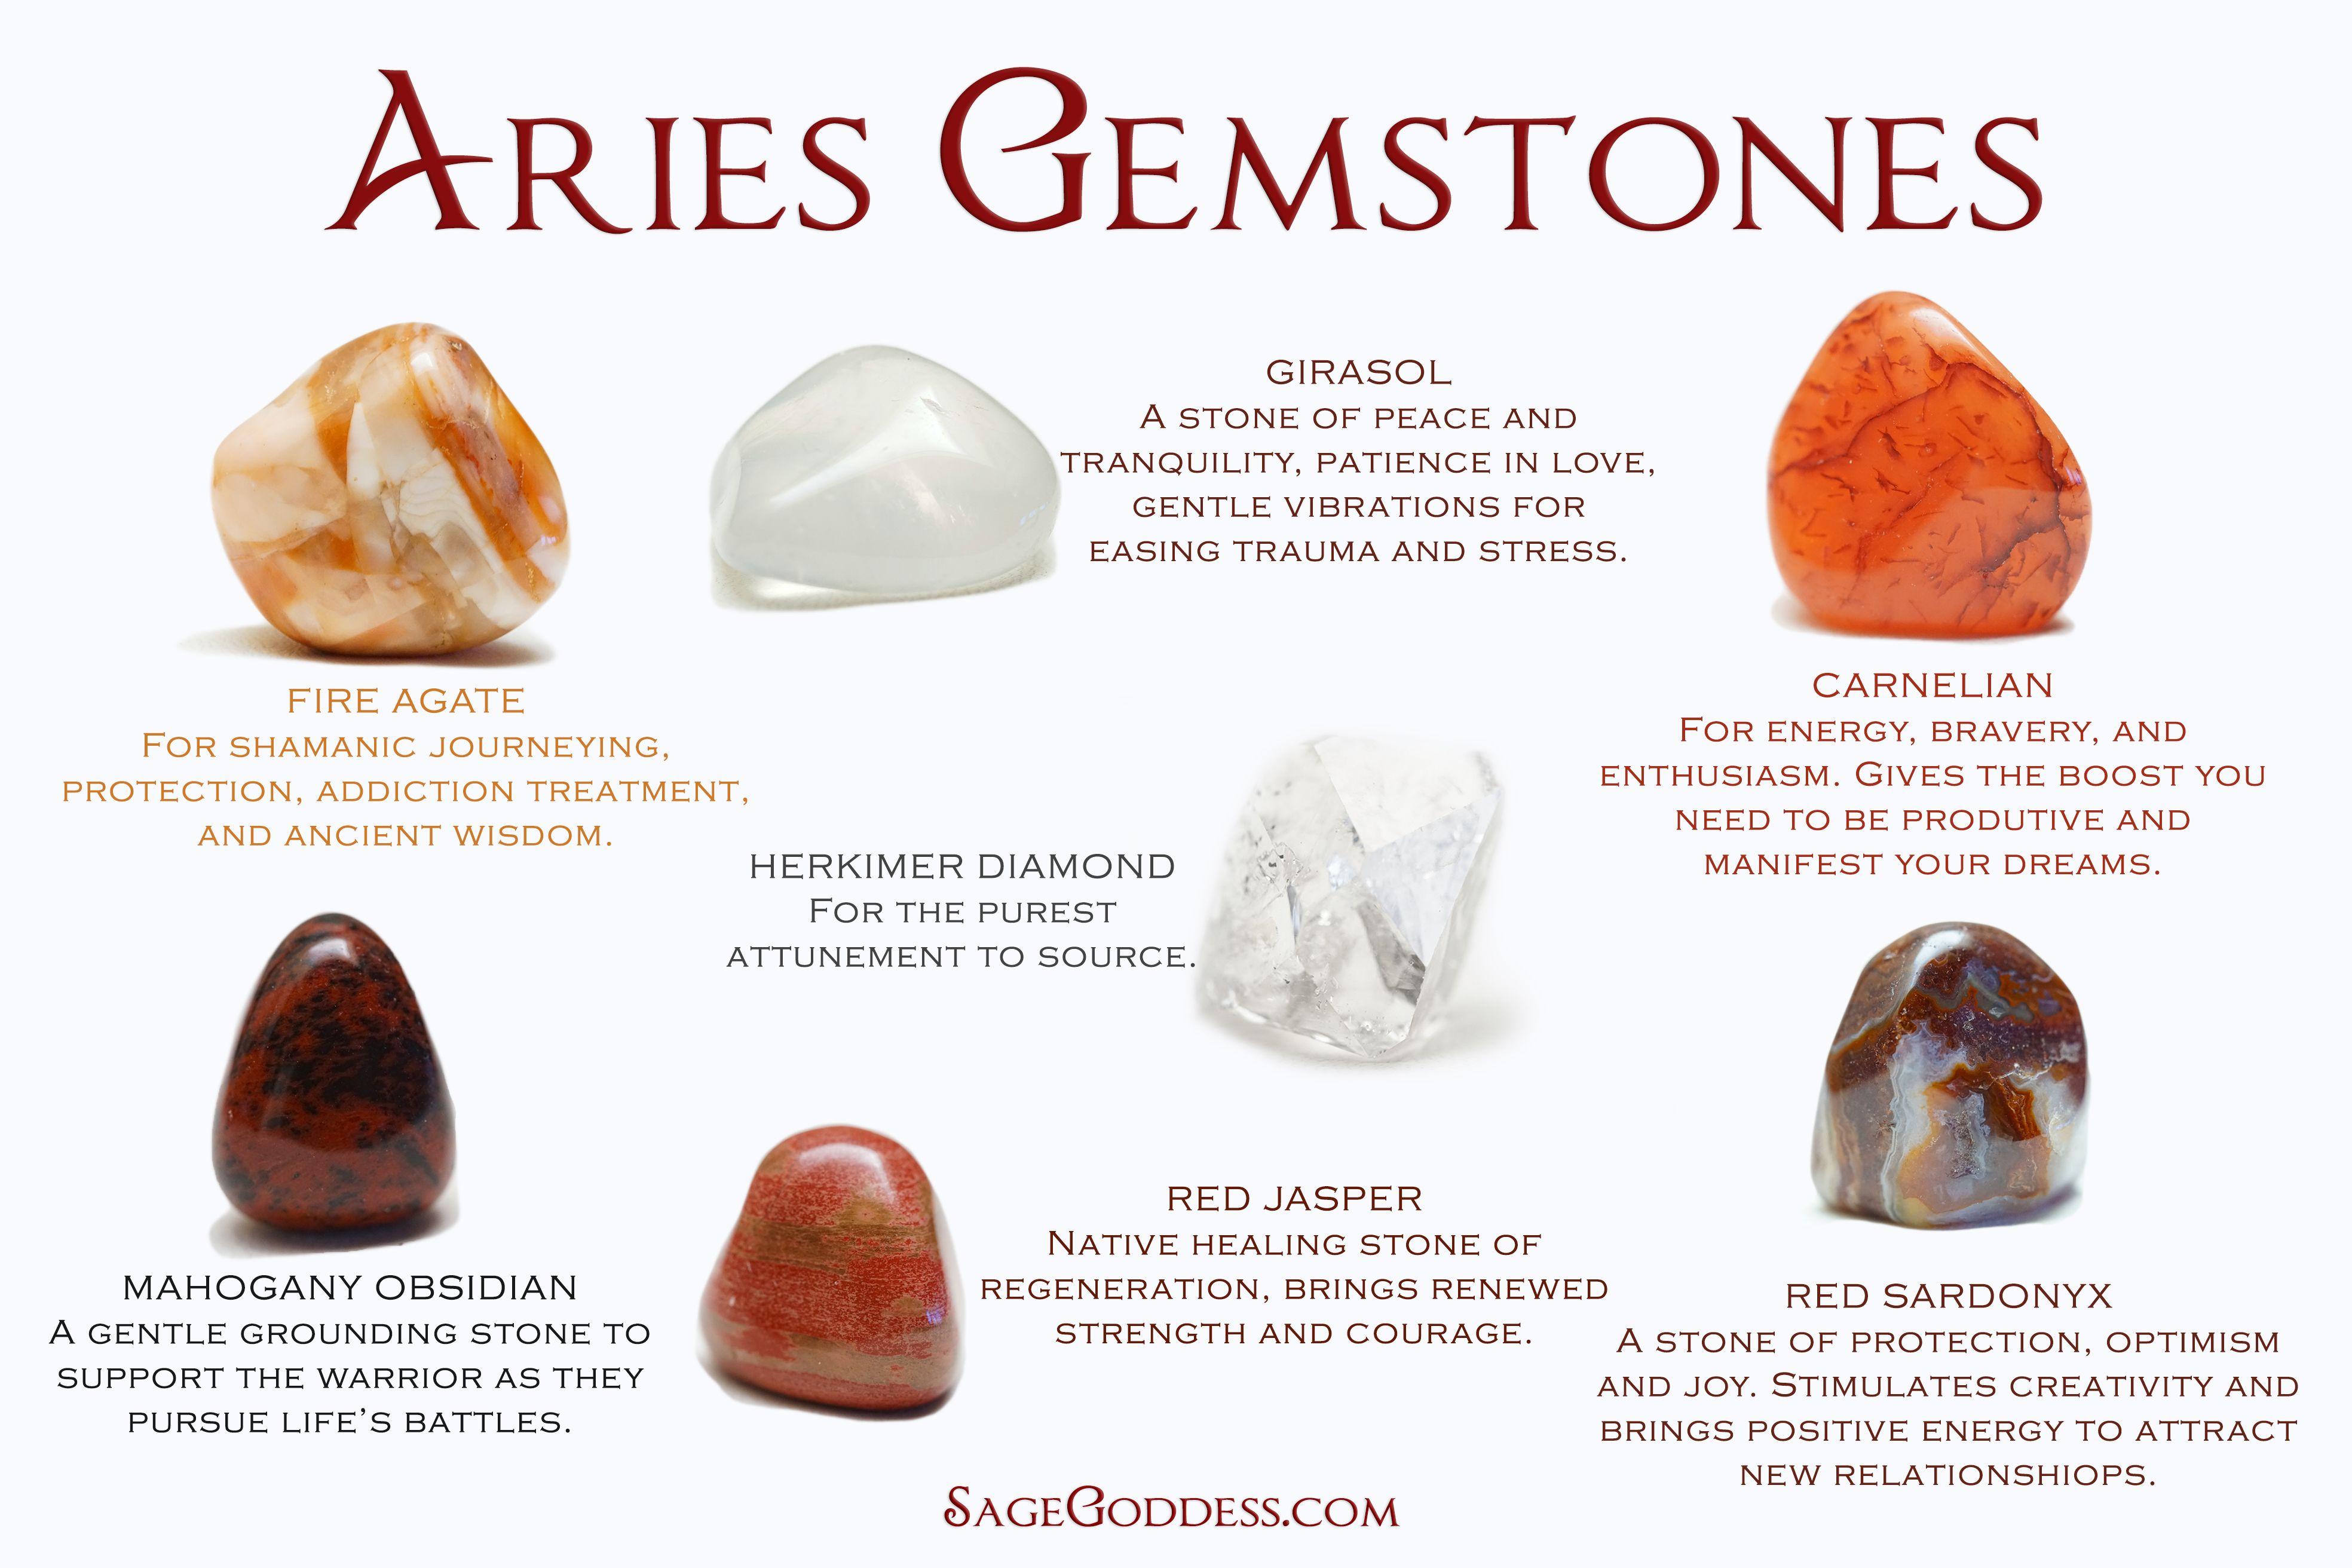 aires gemstones agate girasol carnelian herkimer